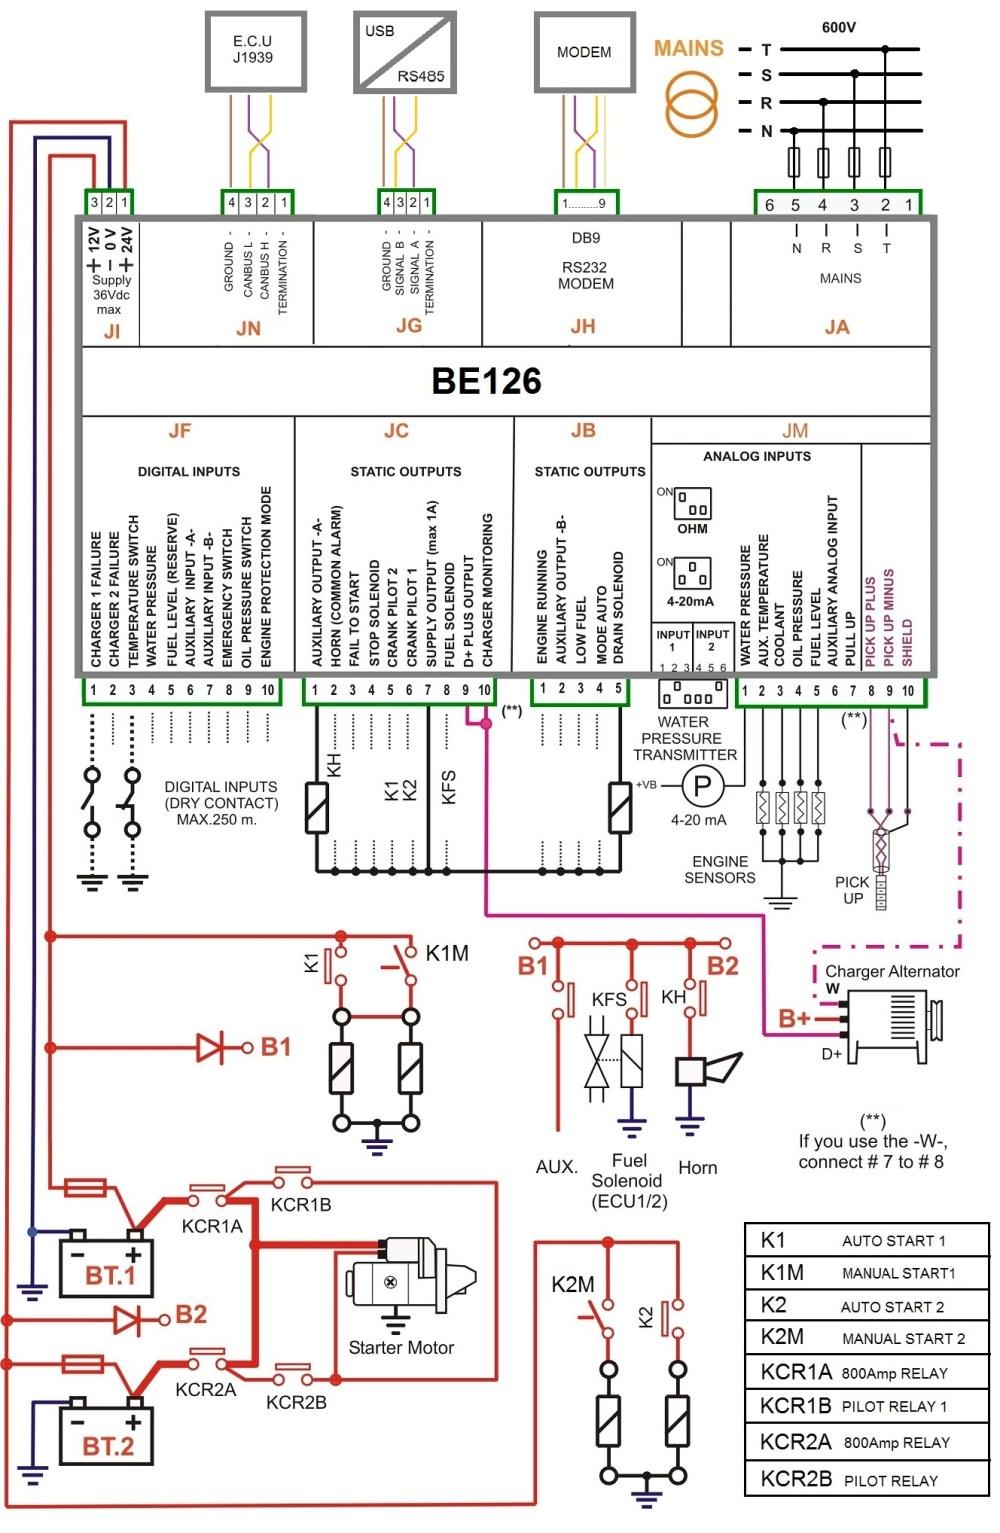 medium resolution of electrical control panel wiring diagram pdf electrical control panel wiring diagram pdf new hardinge hlv